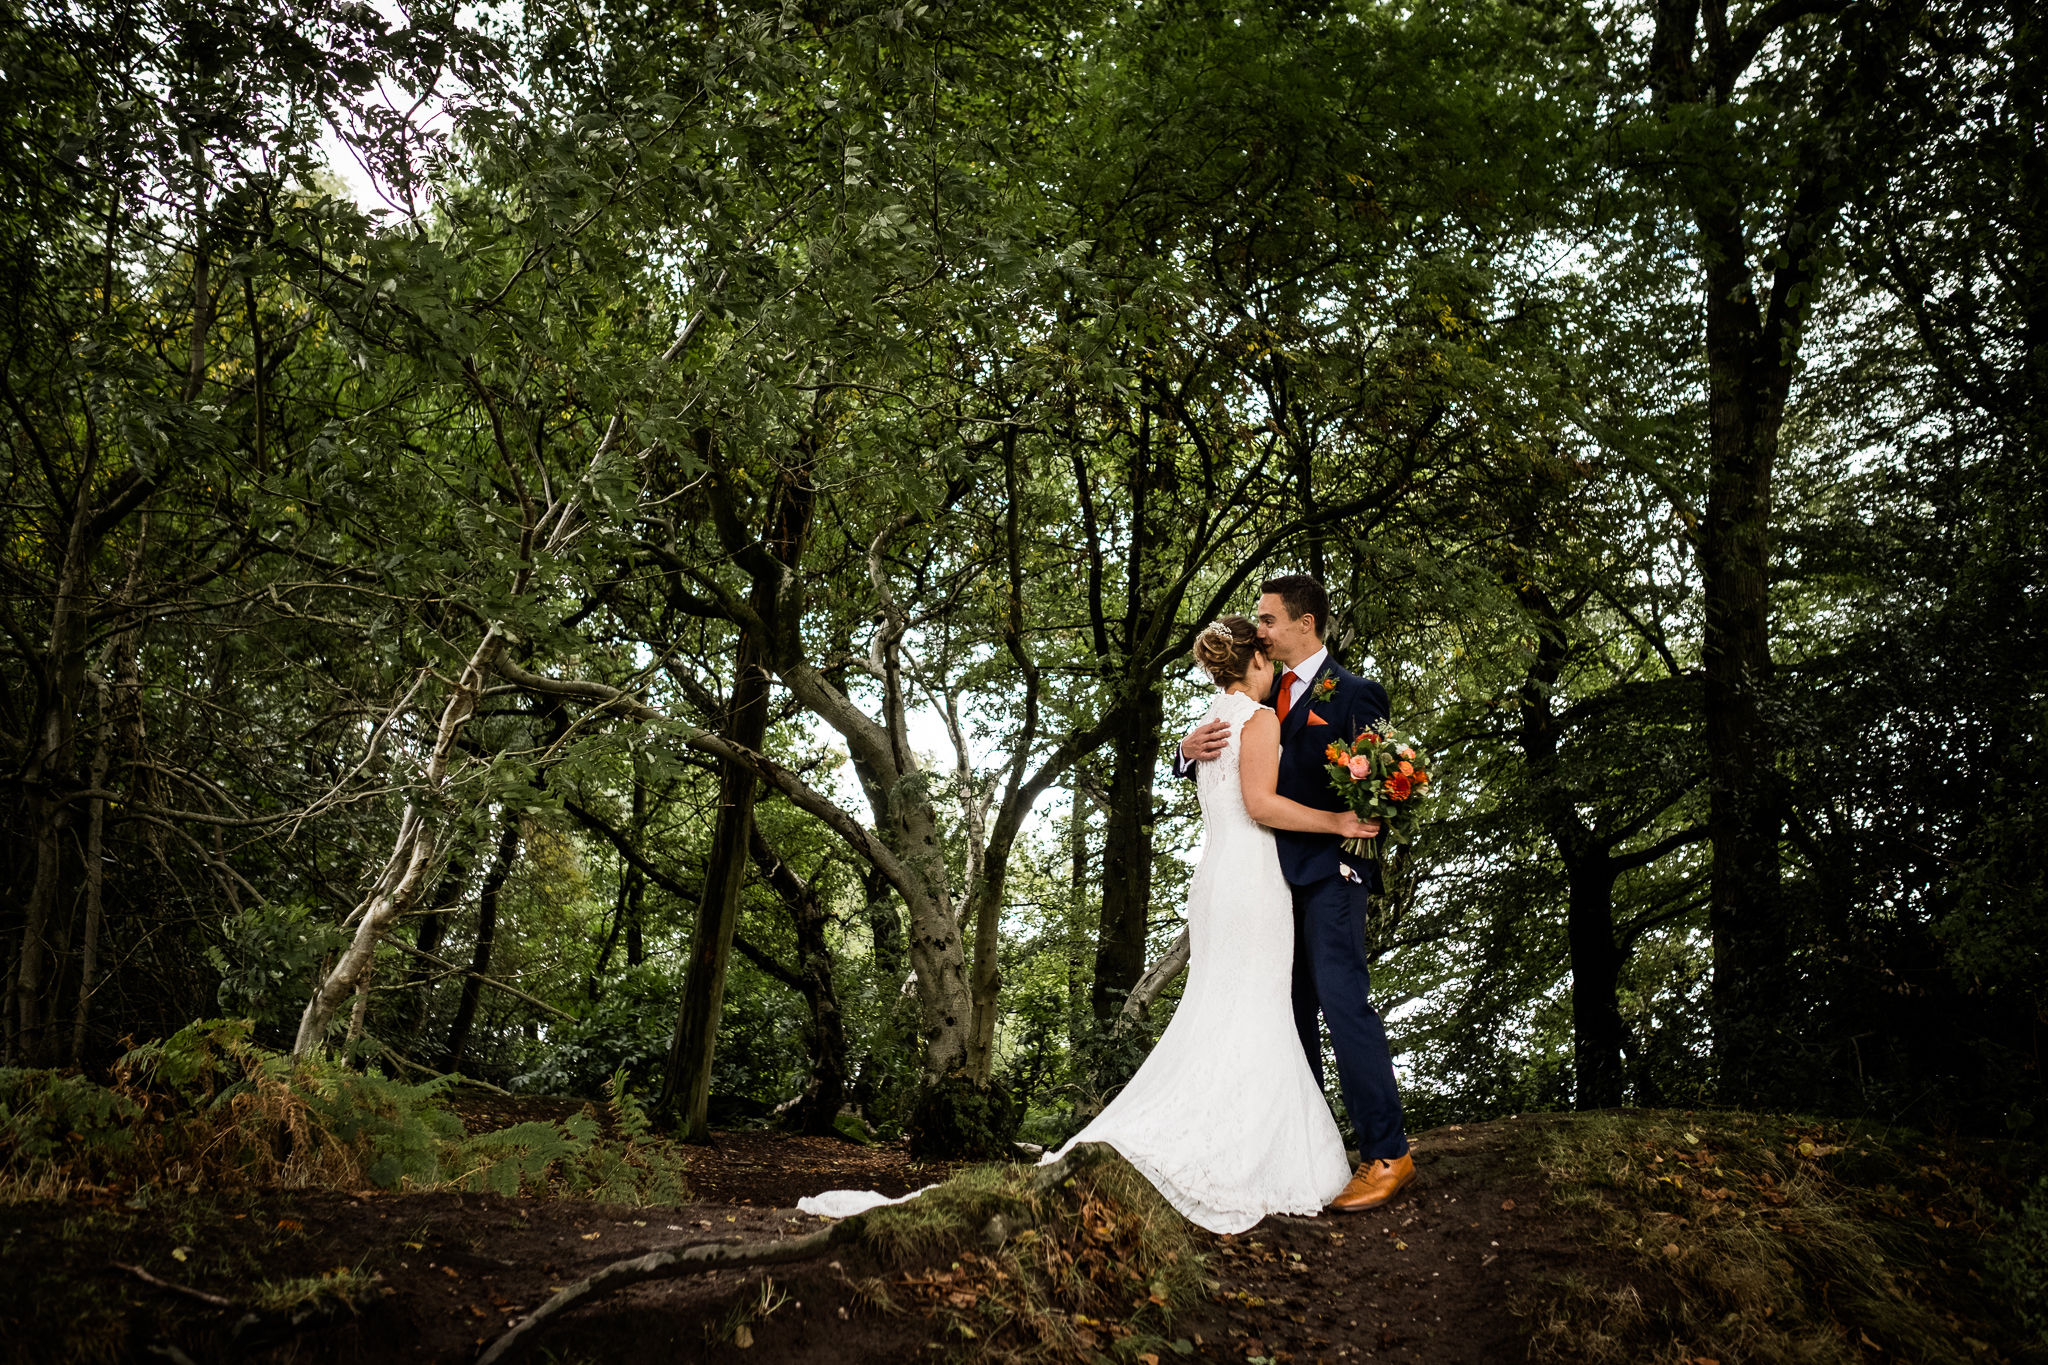 Relaxed Documentary Wedding Photography at The Wizard Inn, Alderley Edge Cheshire - Jenny Harper-48.jpg